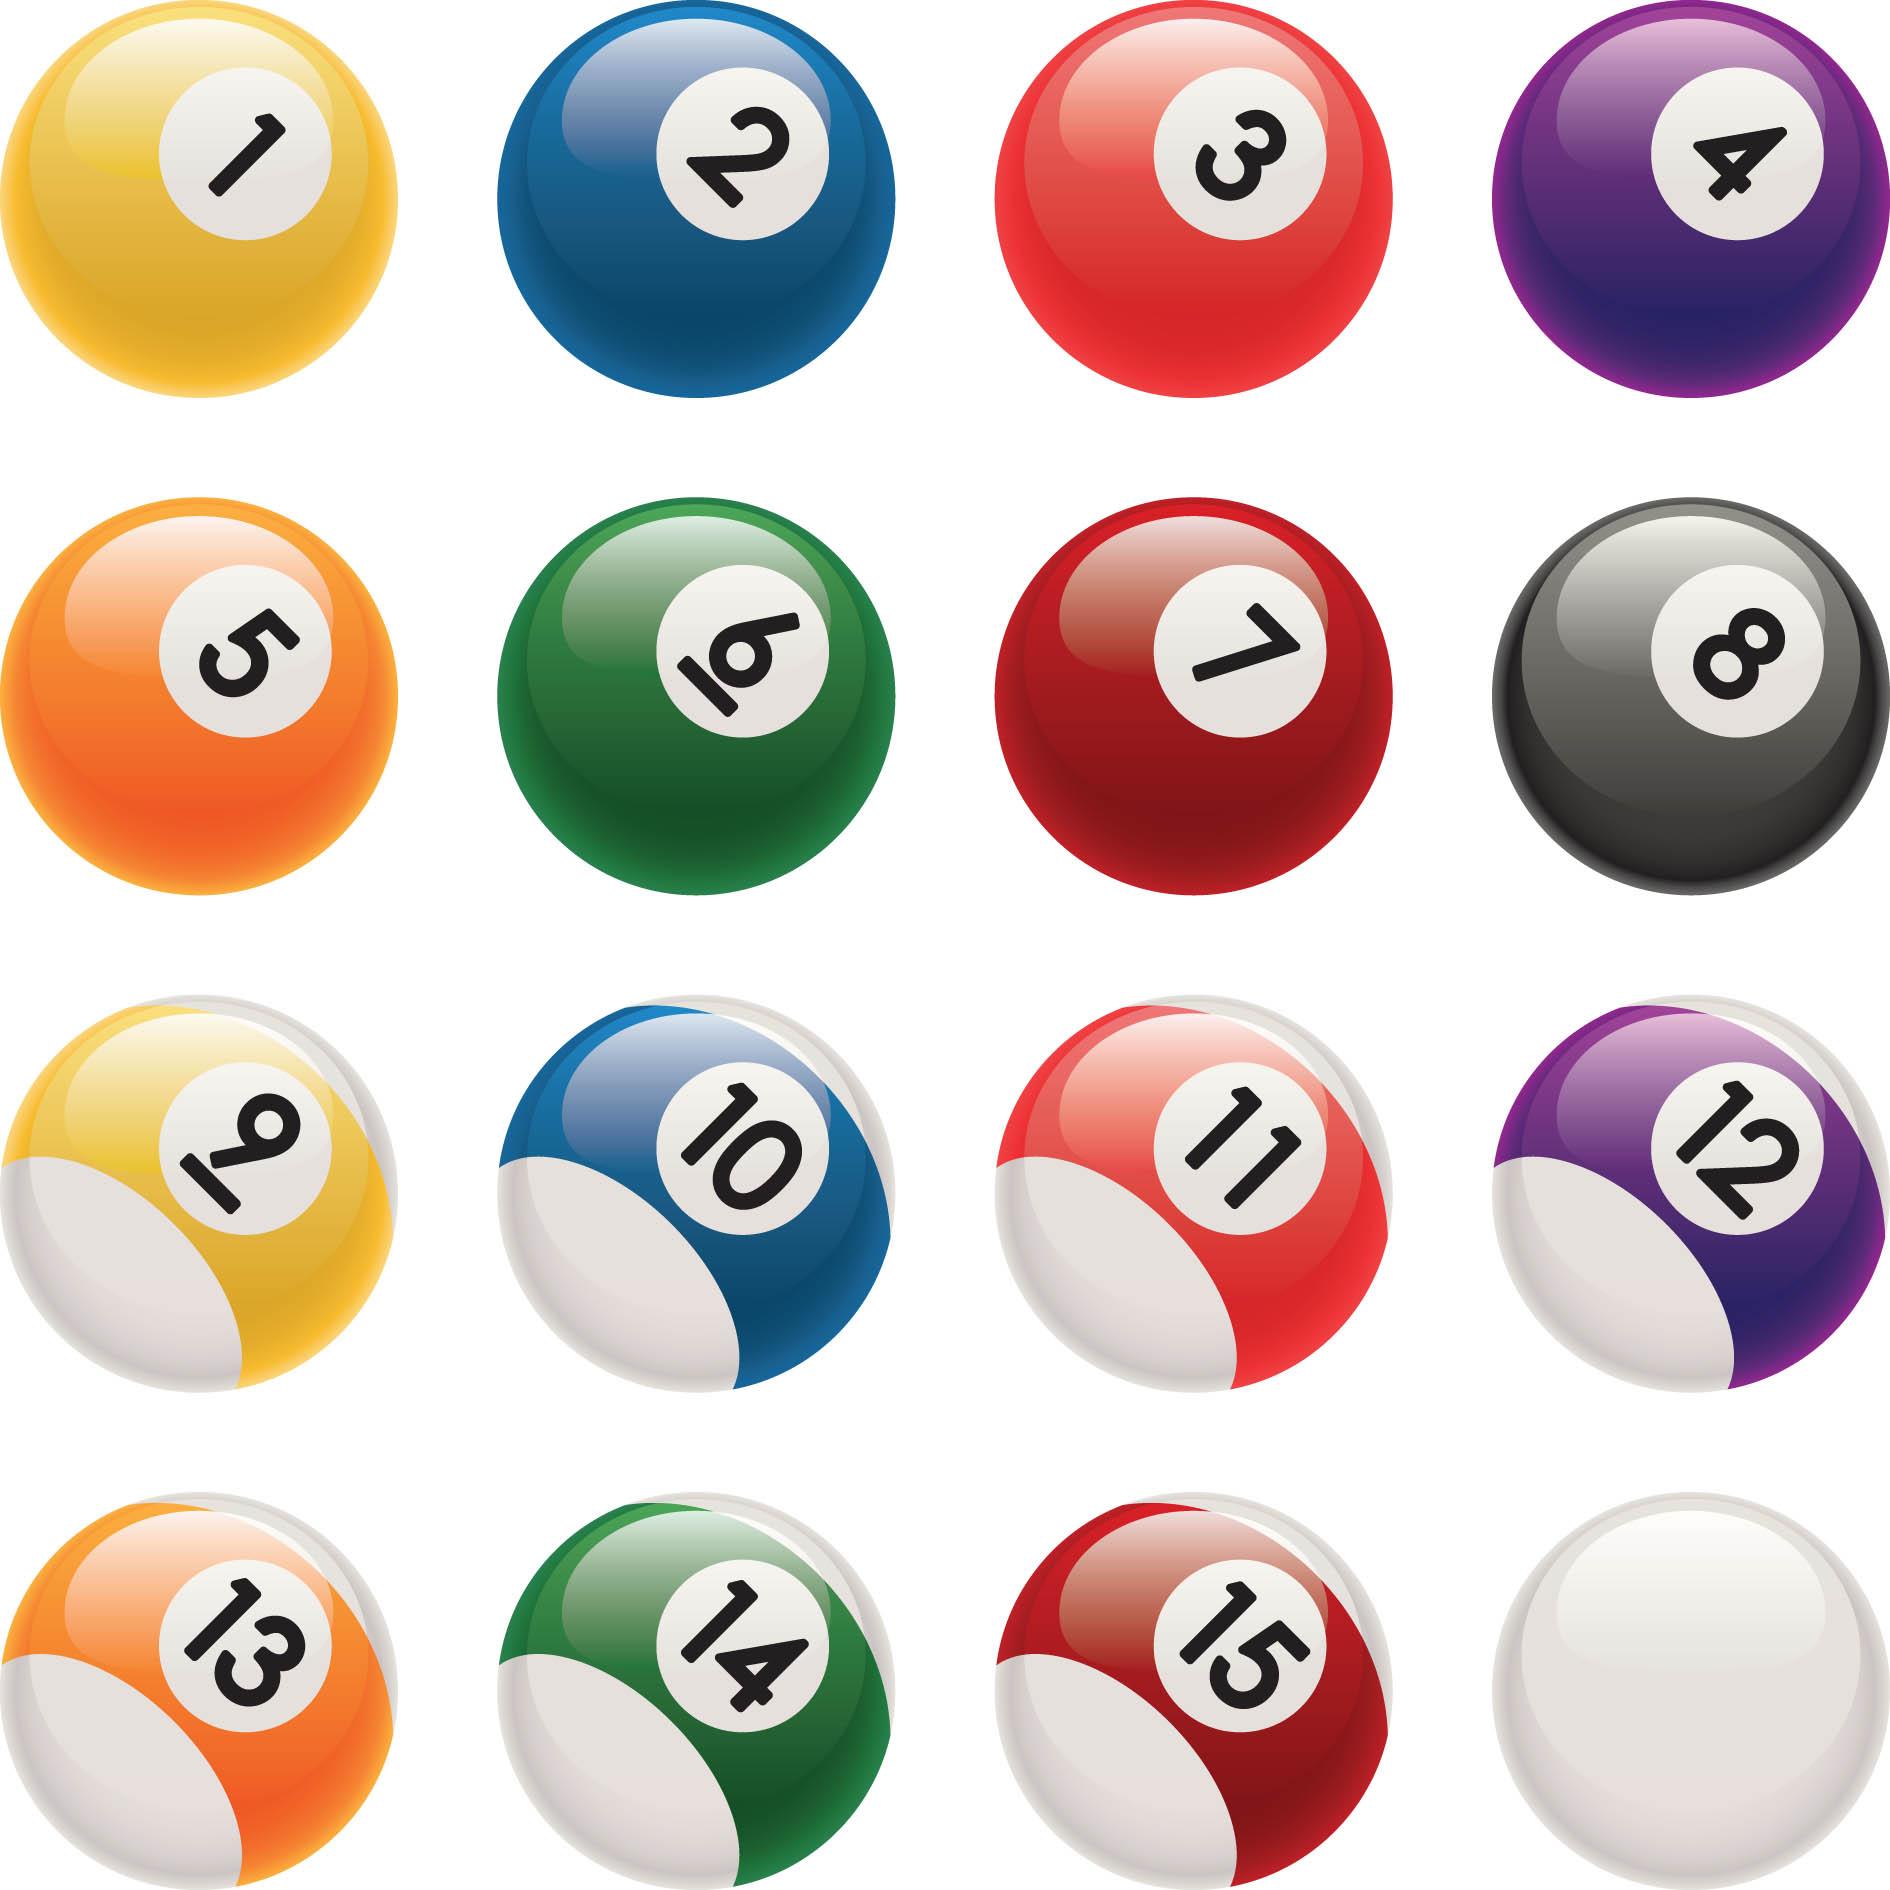 Billiard balls clipart.